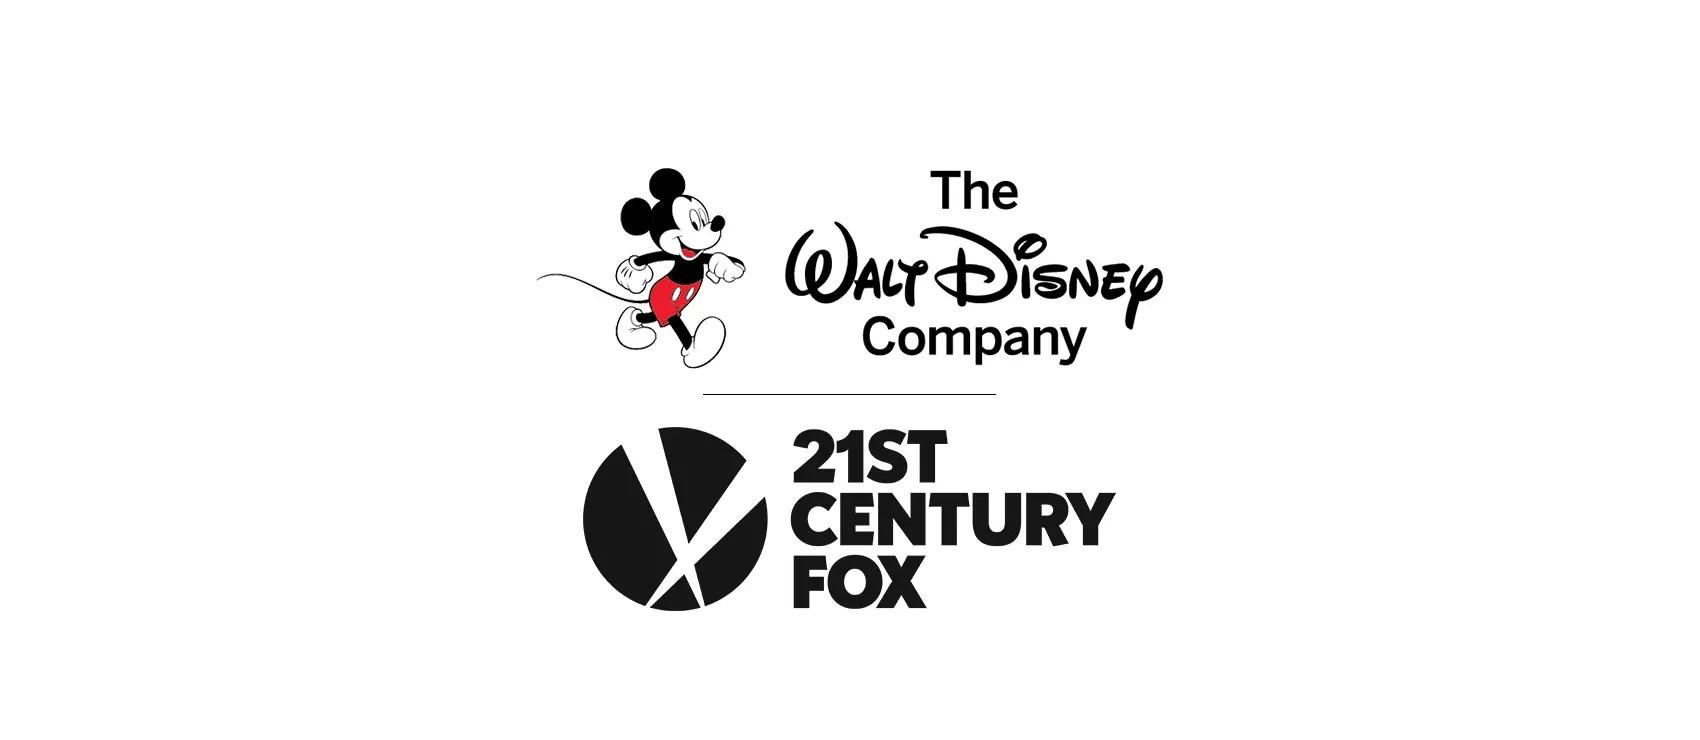 The Walt Disney Company - 21st Century Fox